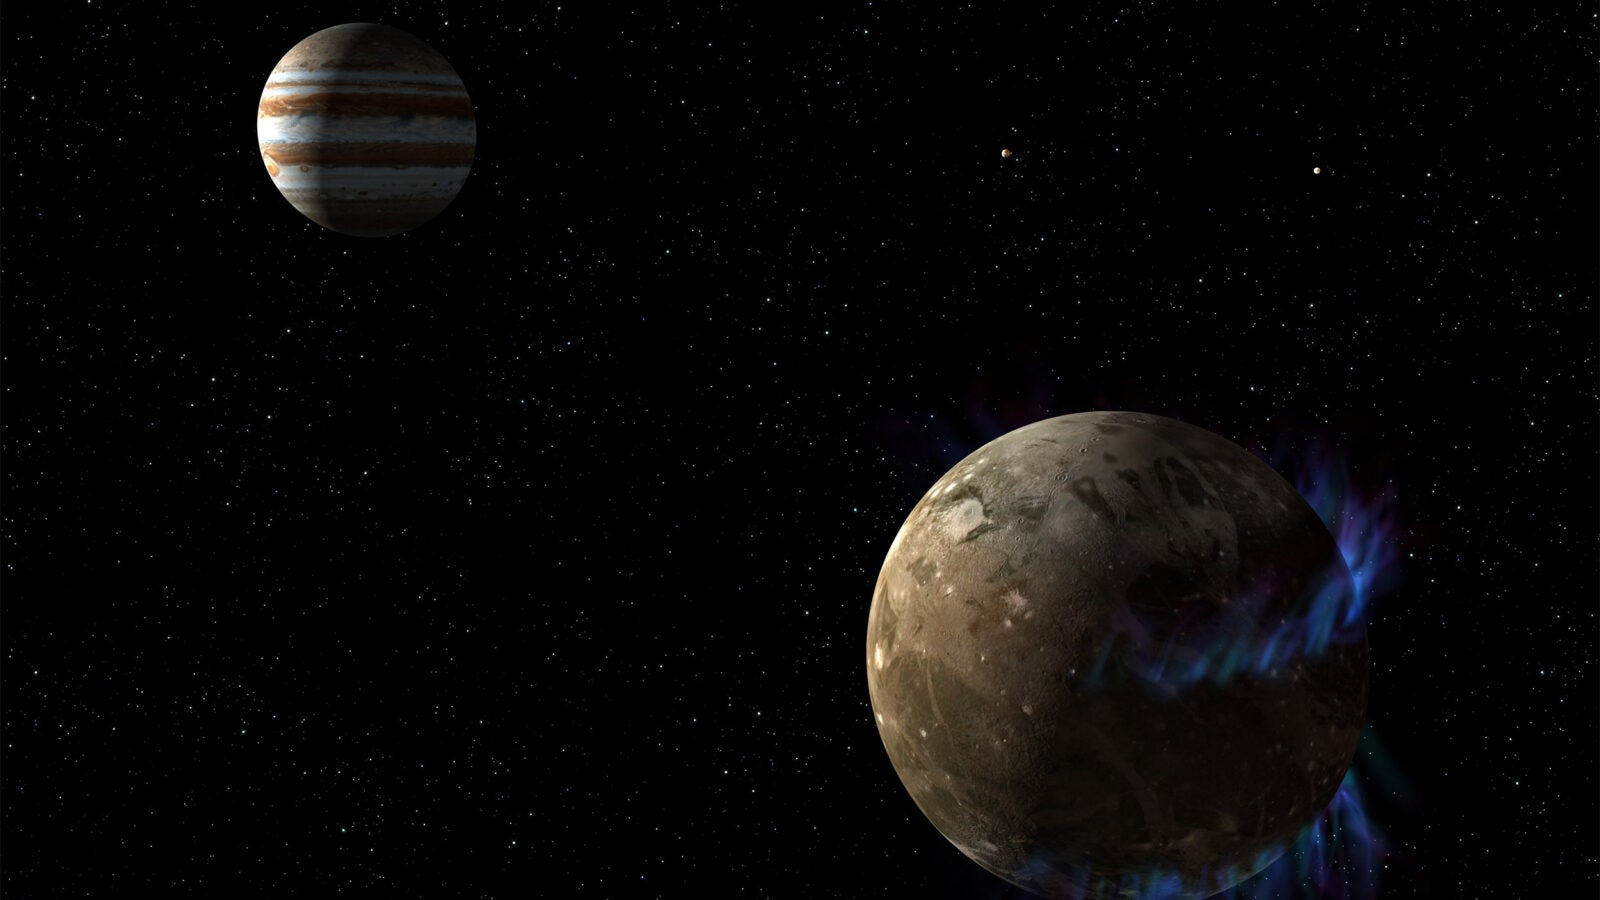 moon Ganymede orbits the giant planet Jupi